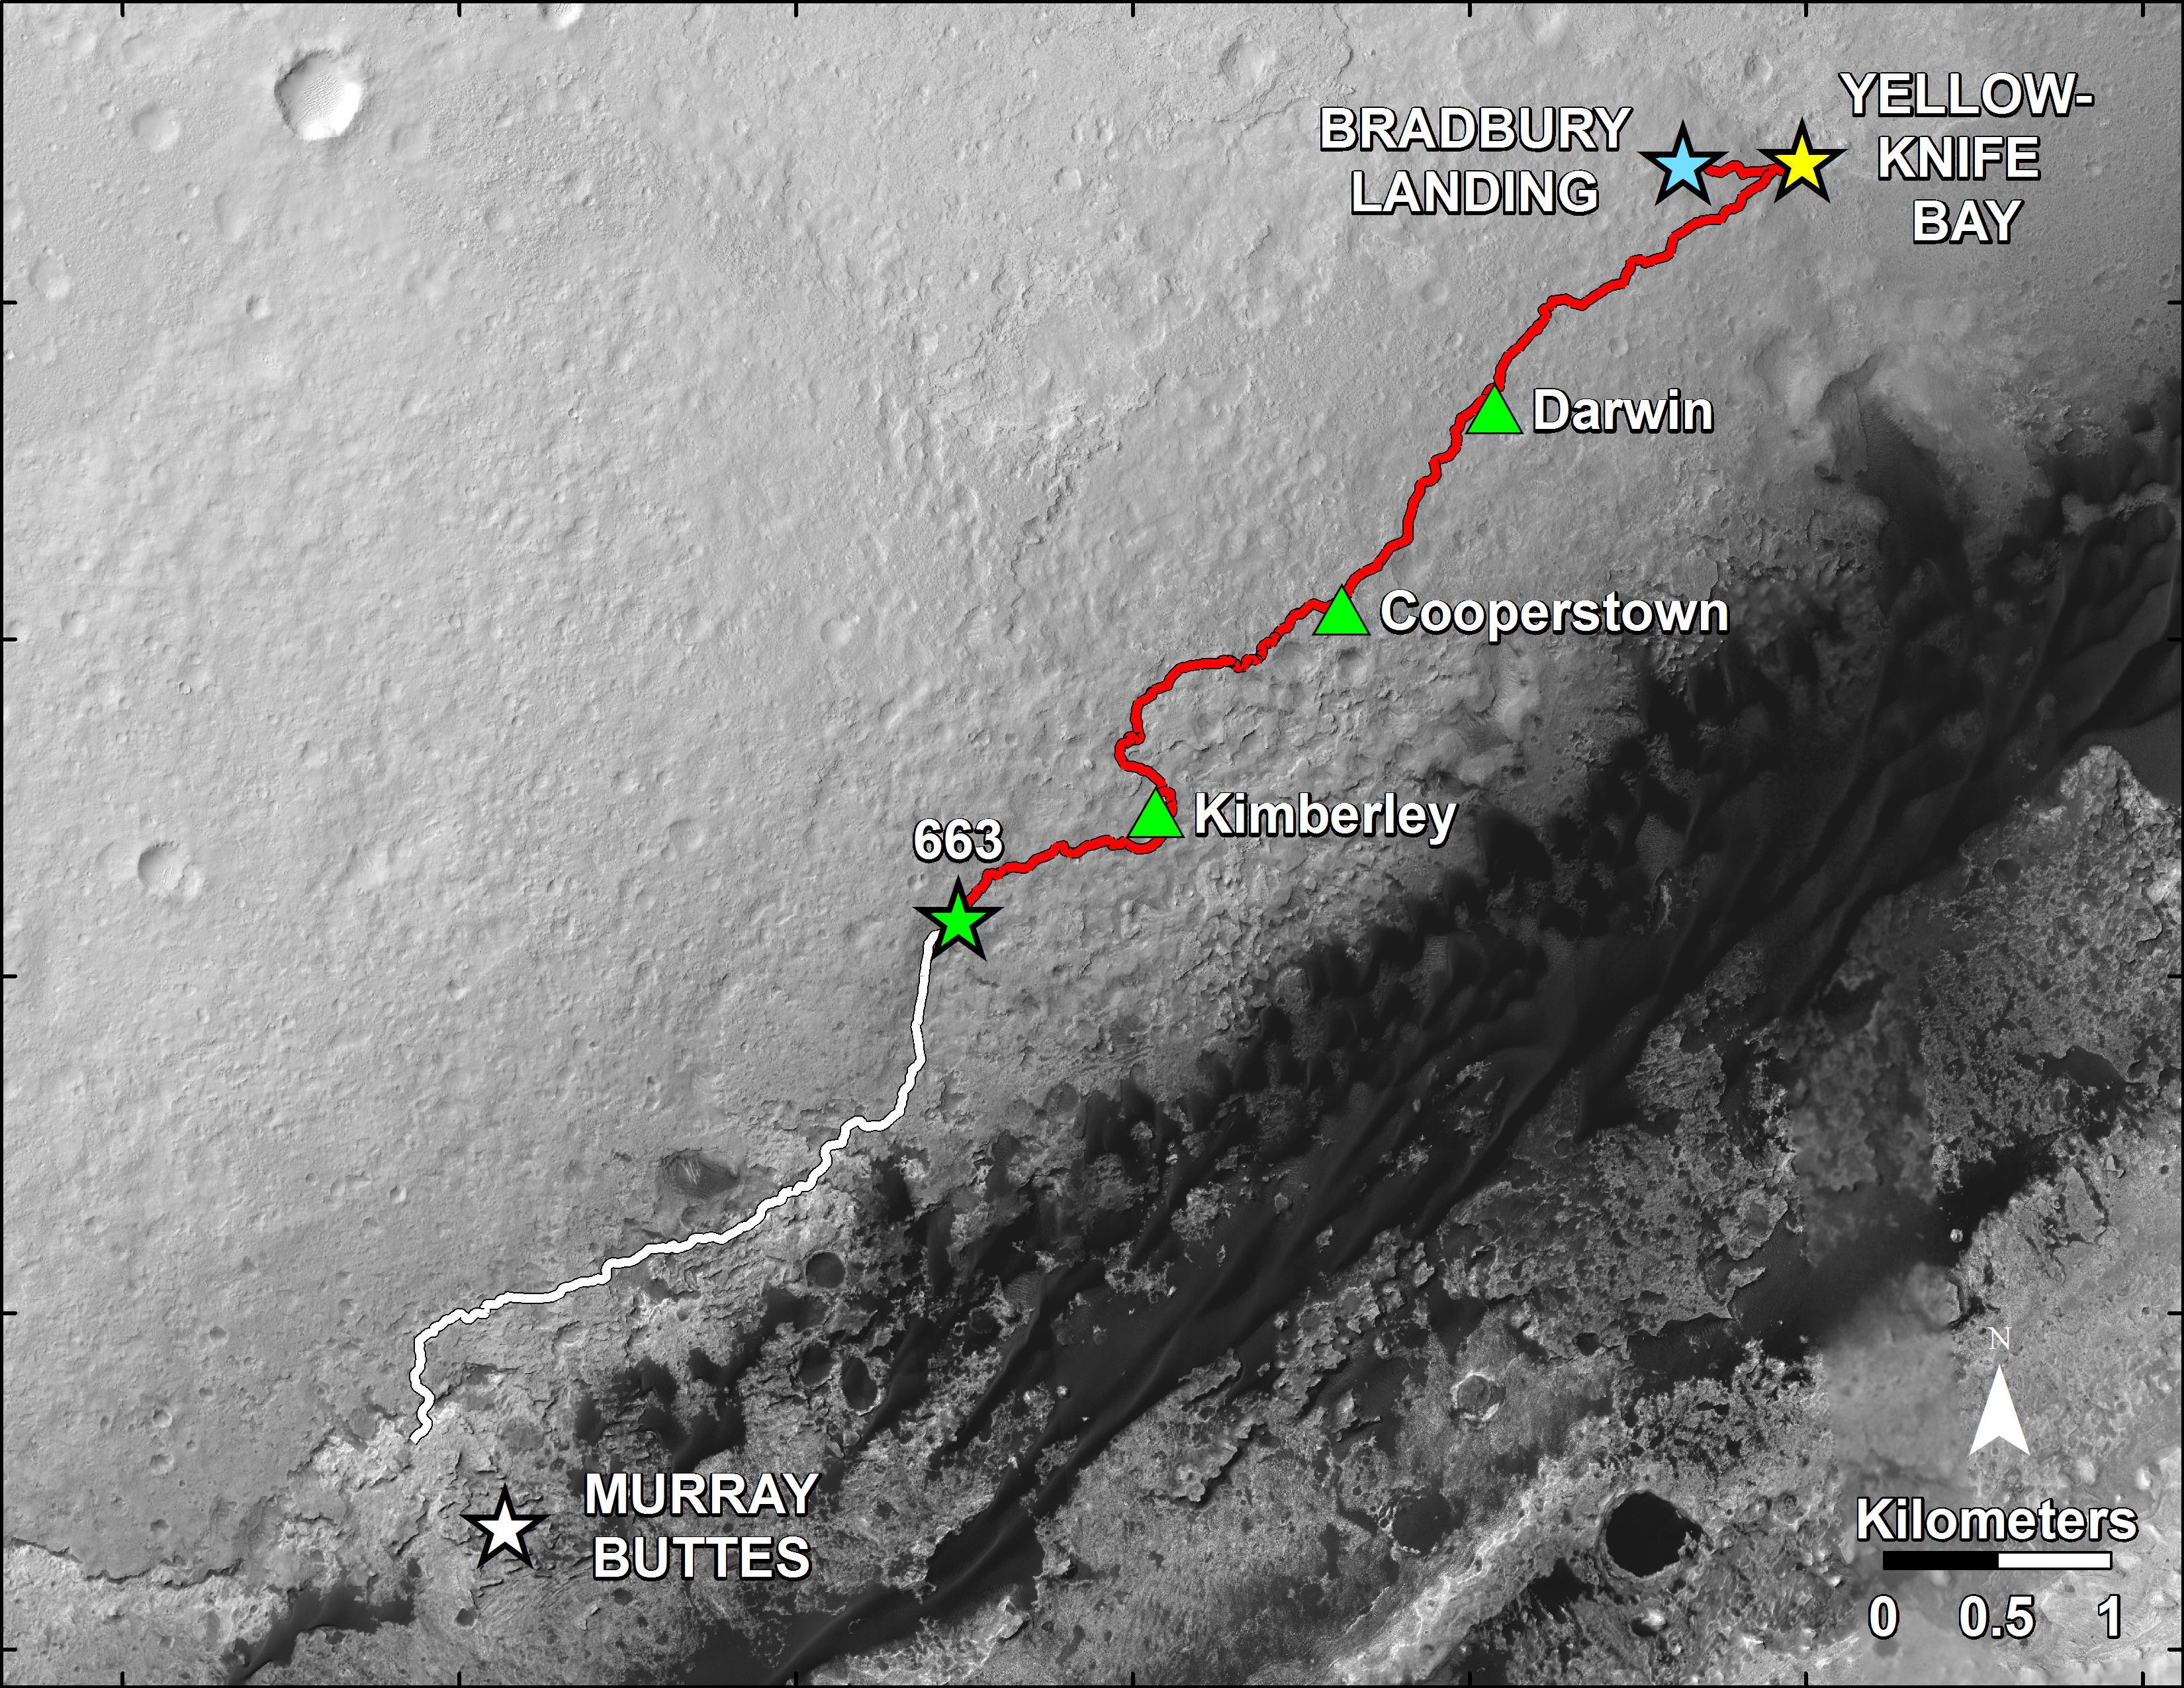 mars exploration rover landing system - photo #40